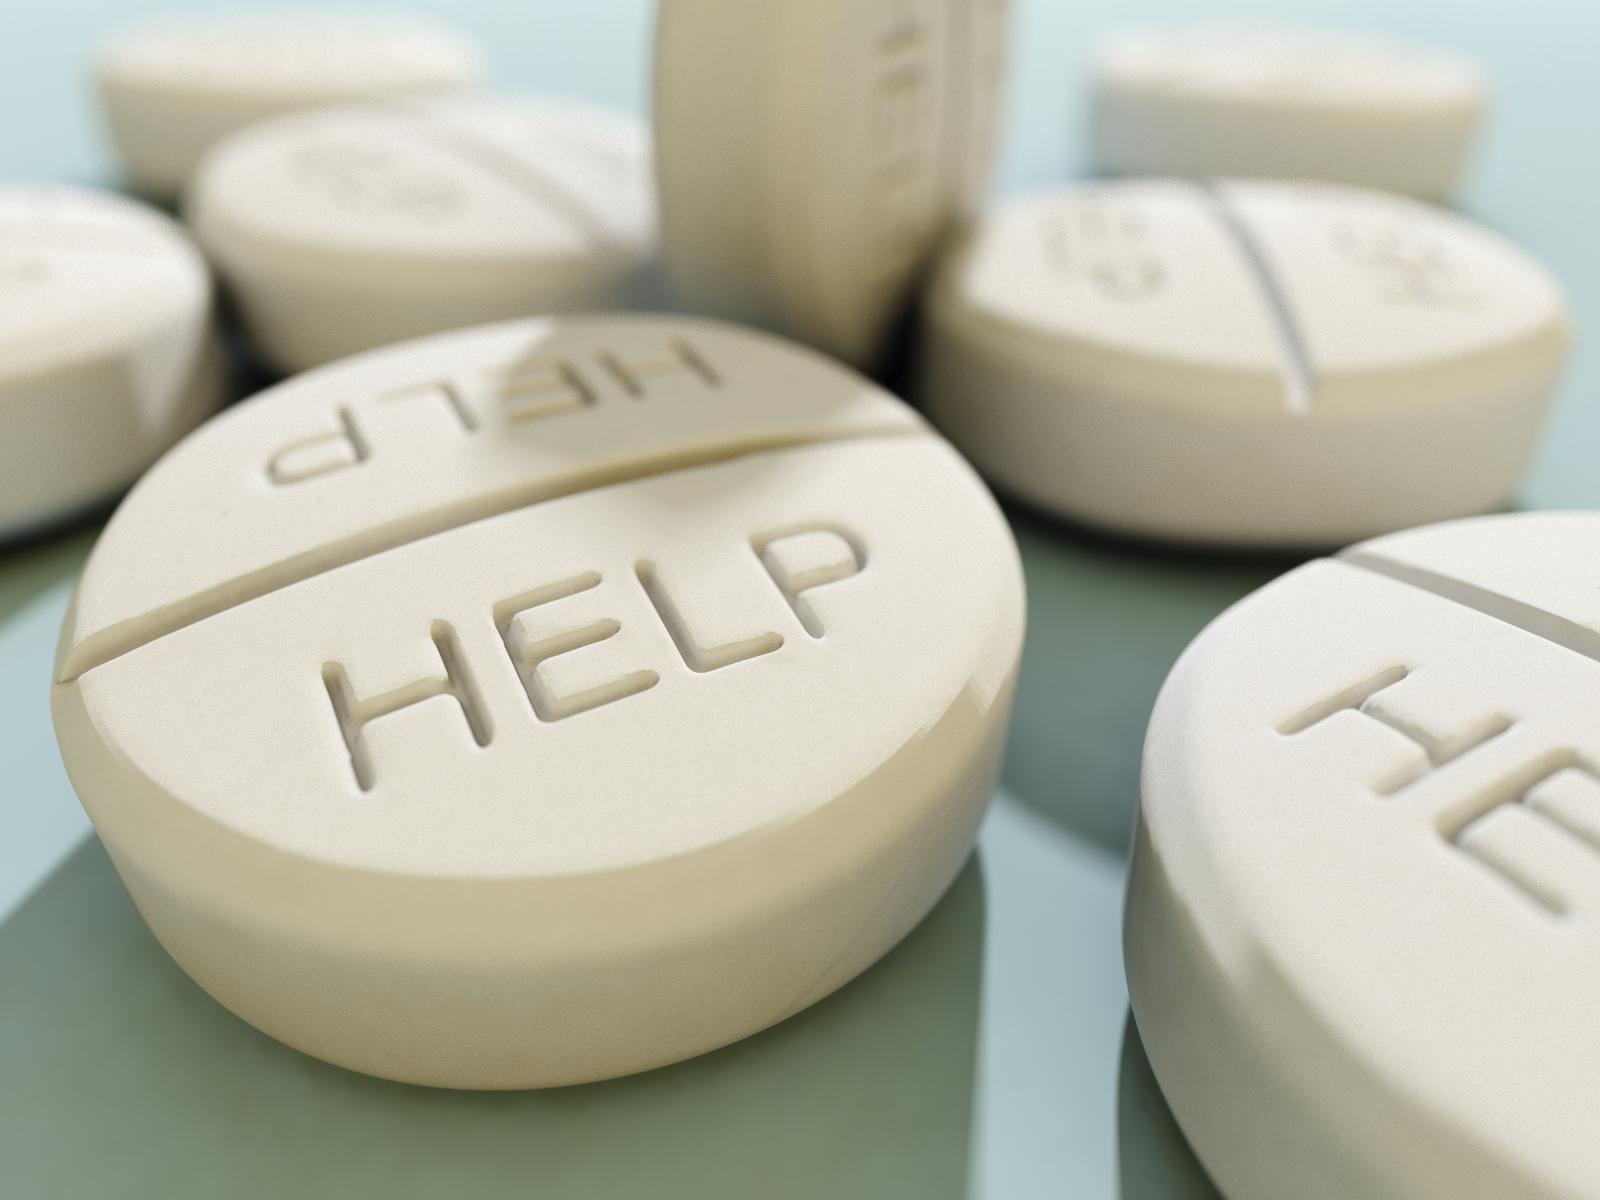 A Guide To Prescription Drug Abuse